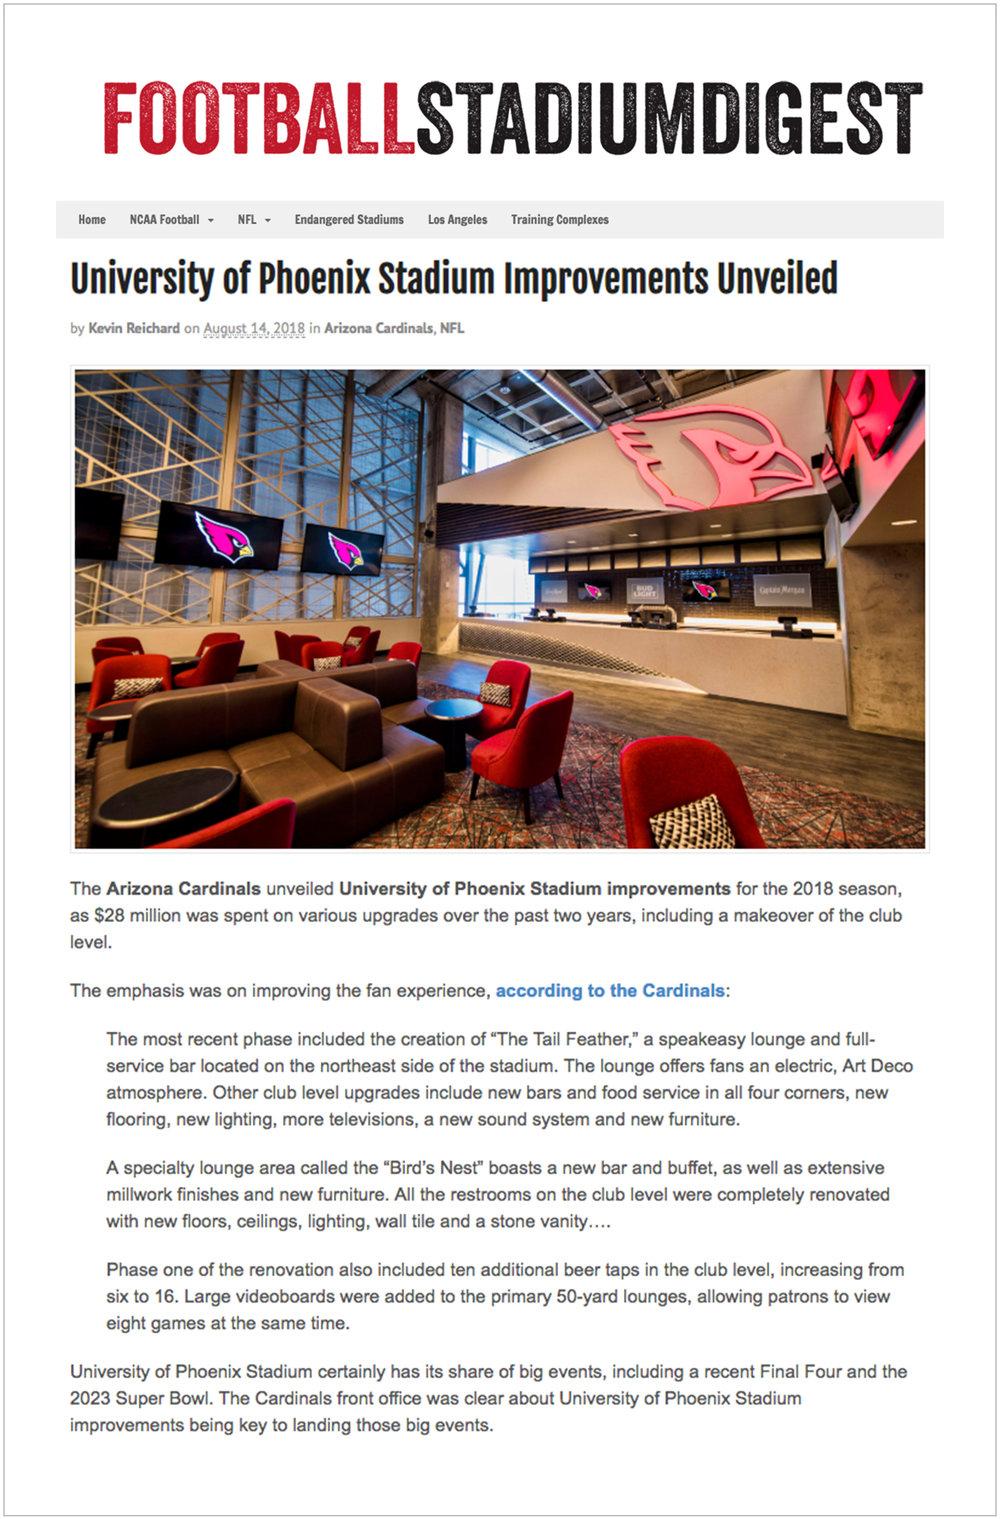 180823 Football Stadium Digest-Cardinals Article.jpg